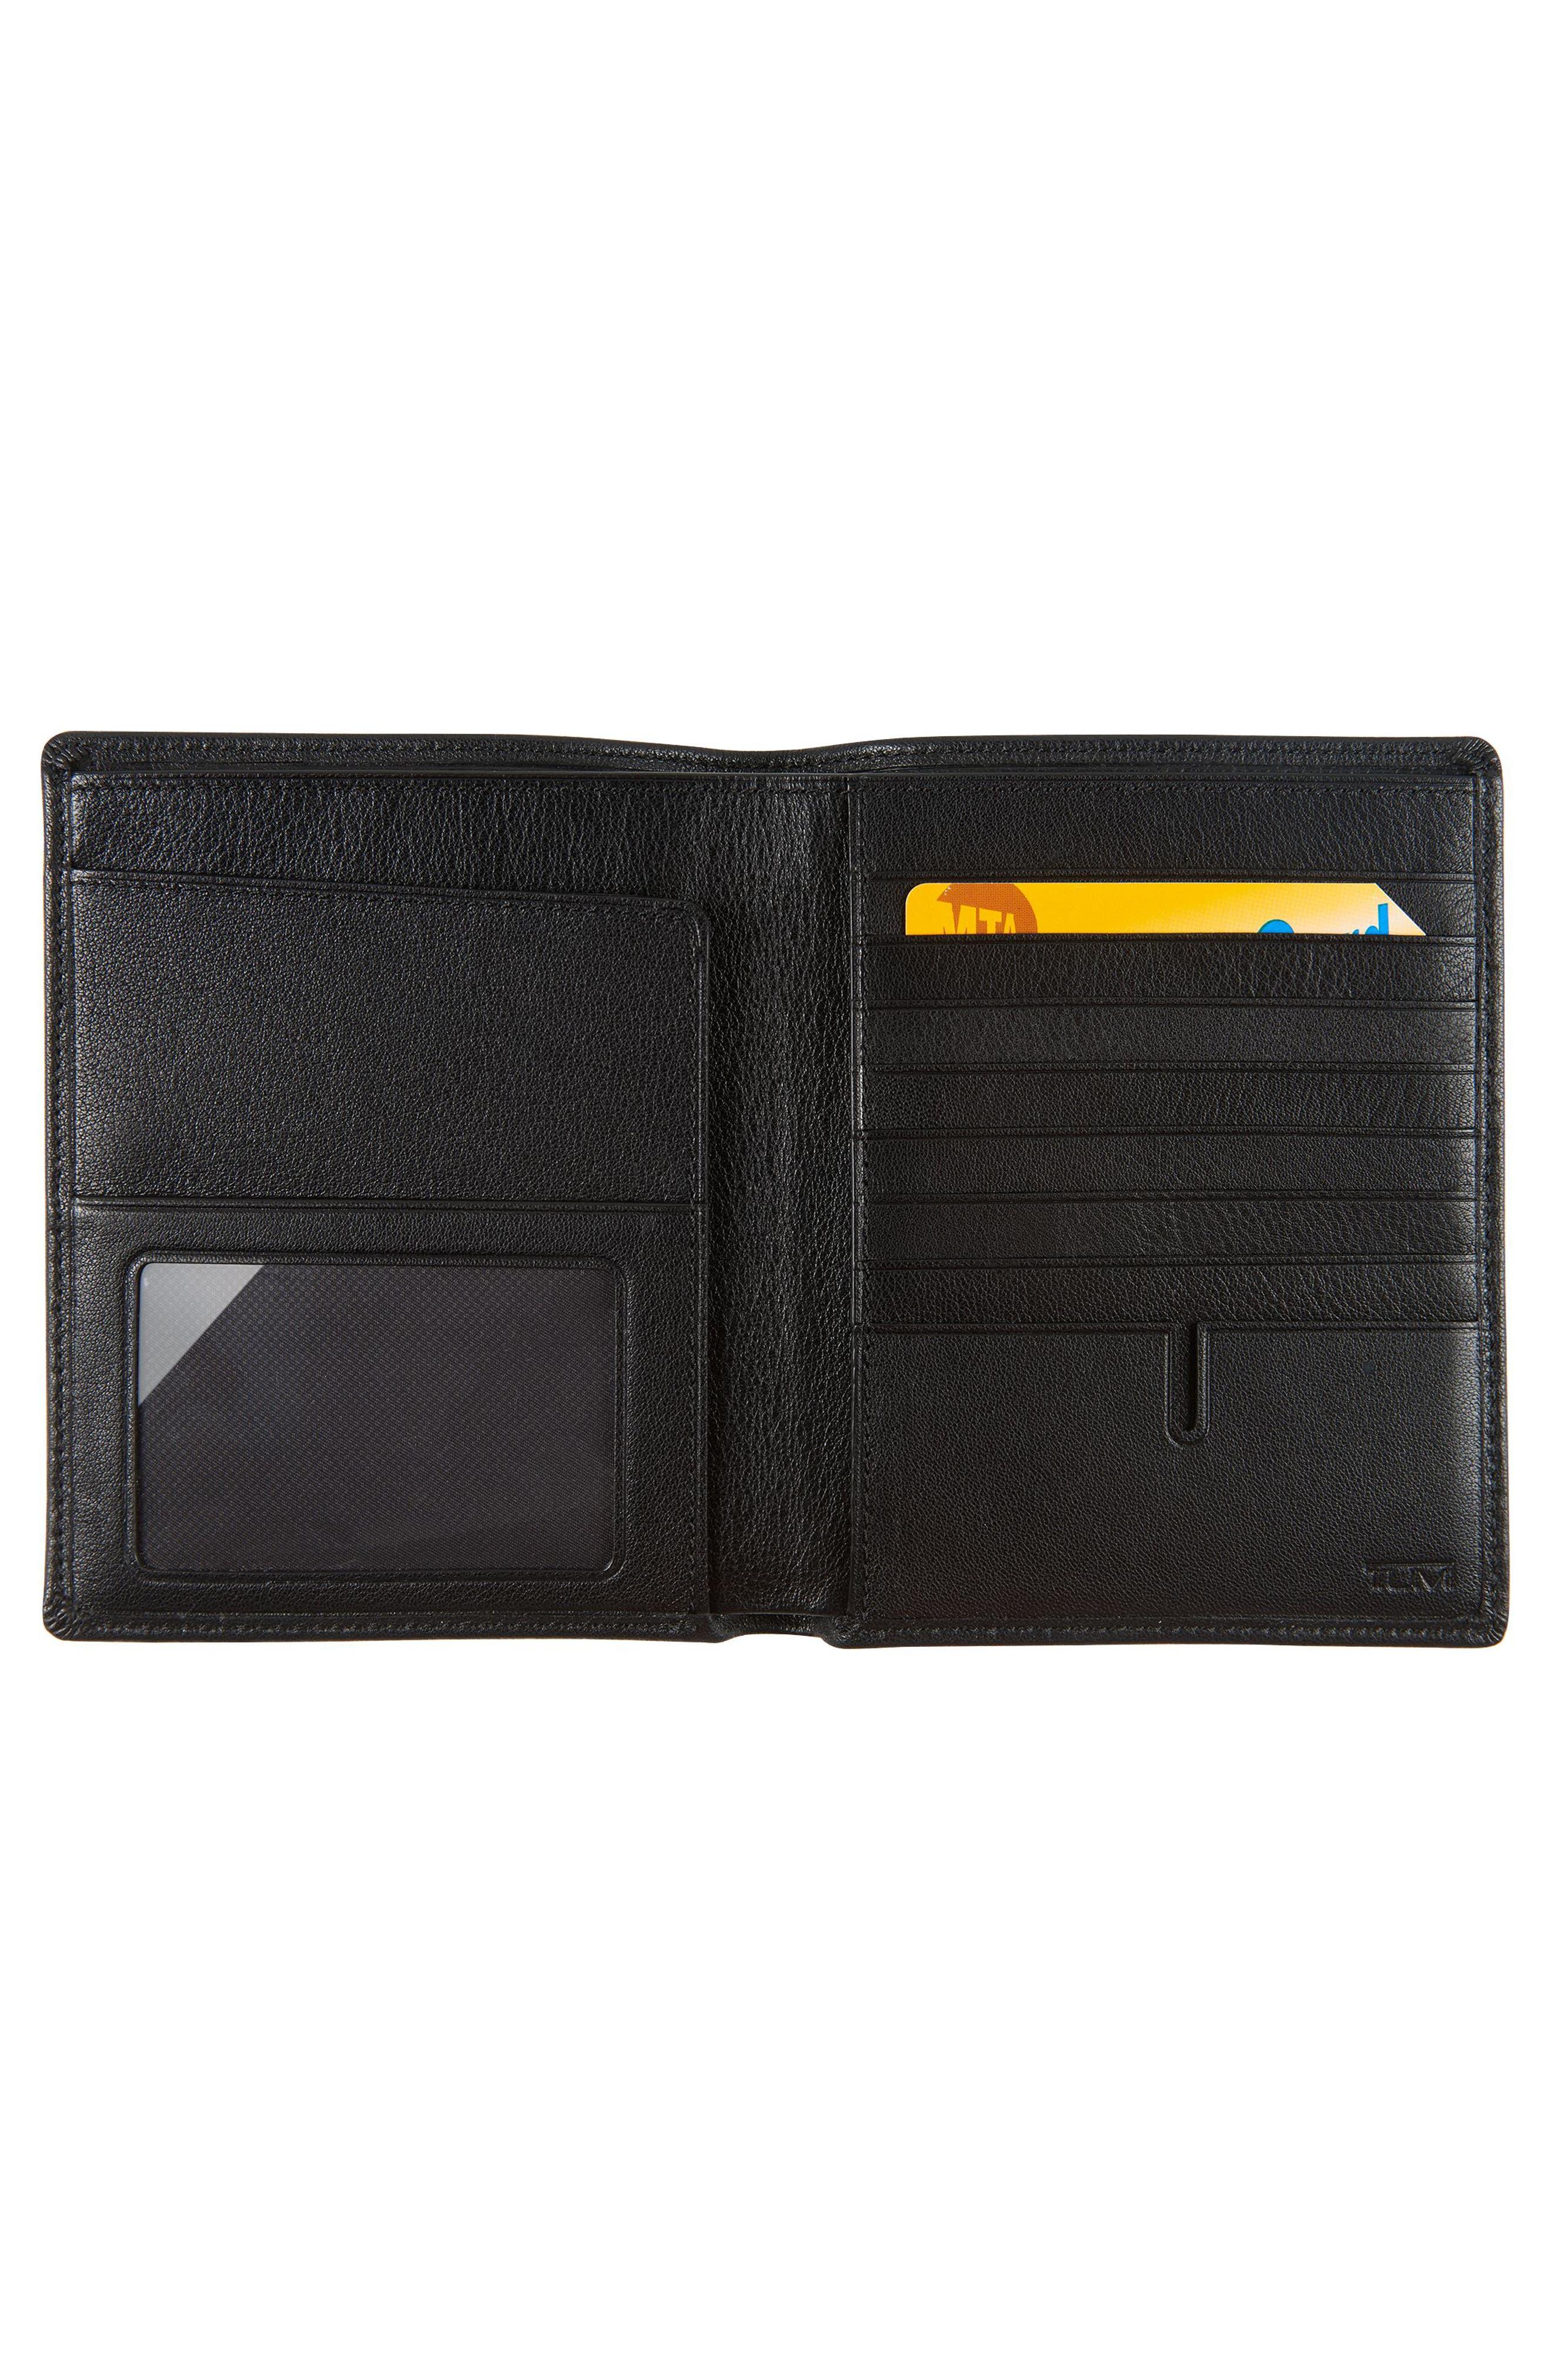 Leather Passport Case,                             Alternate thumbnail 2, color,                             011